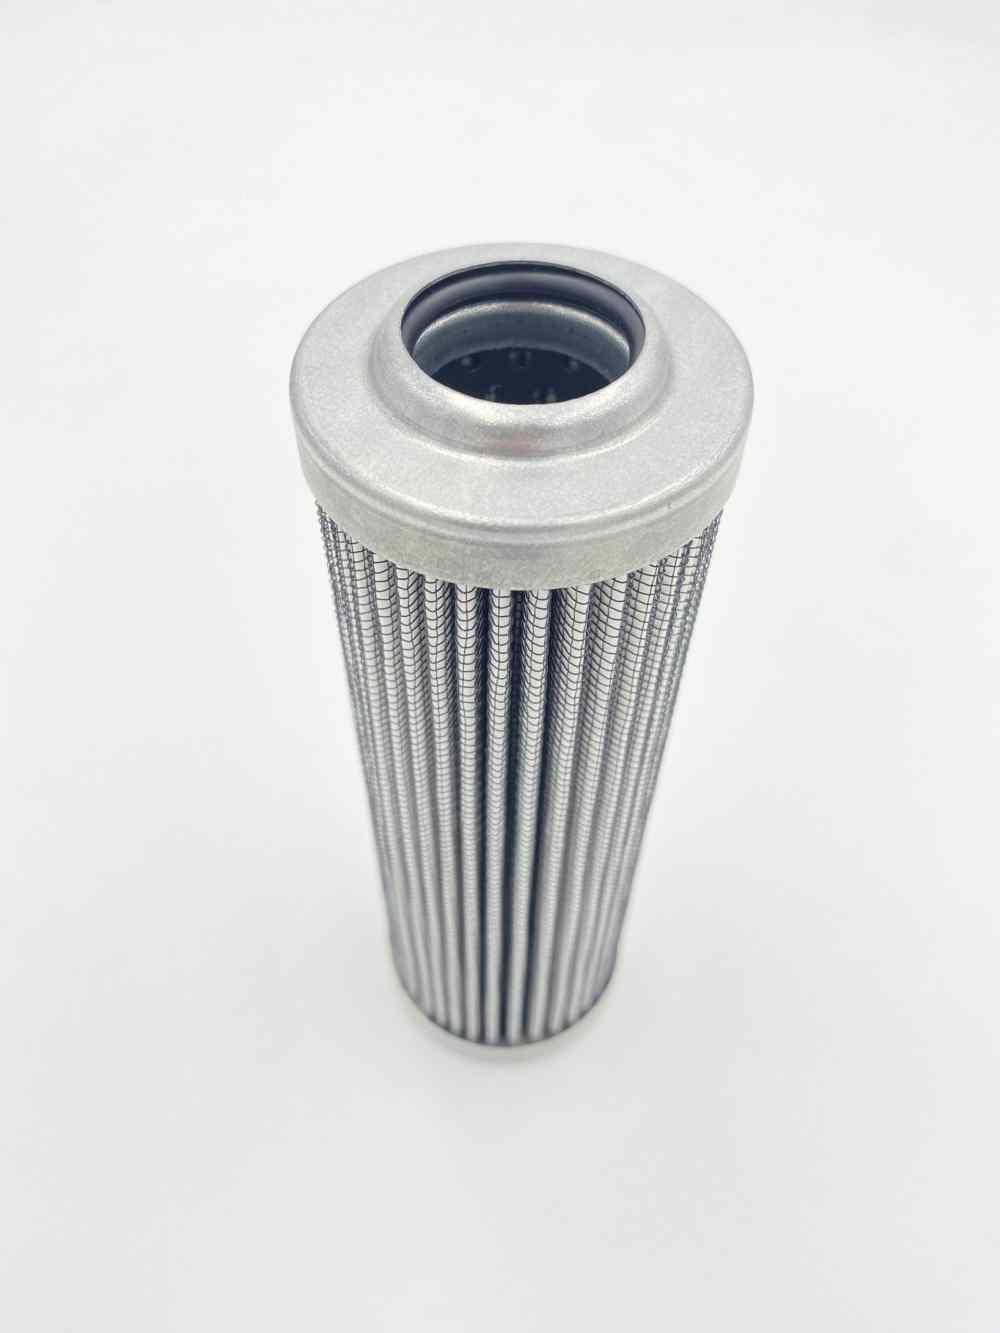 Filter for RMT B-SMART 6-70 Press Brakes